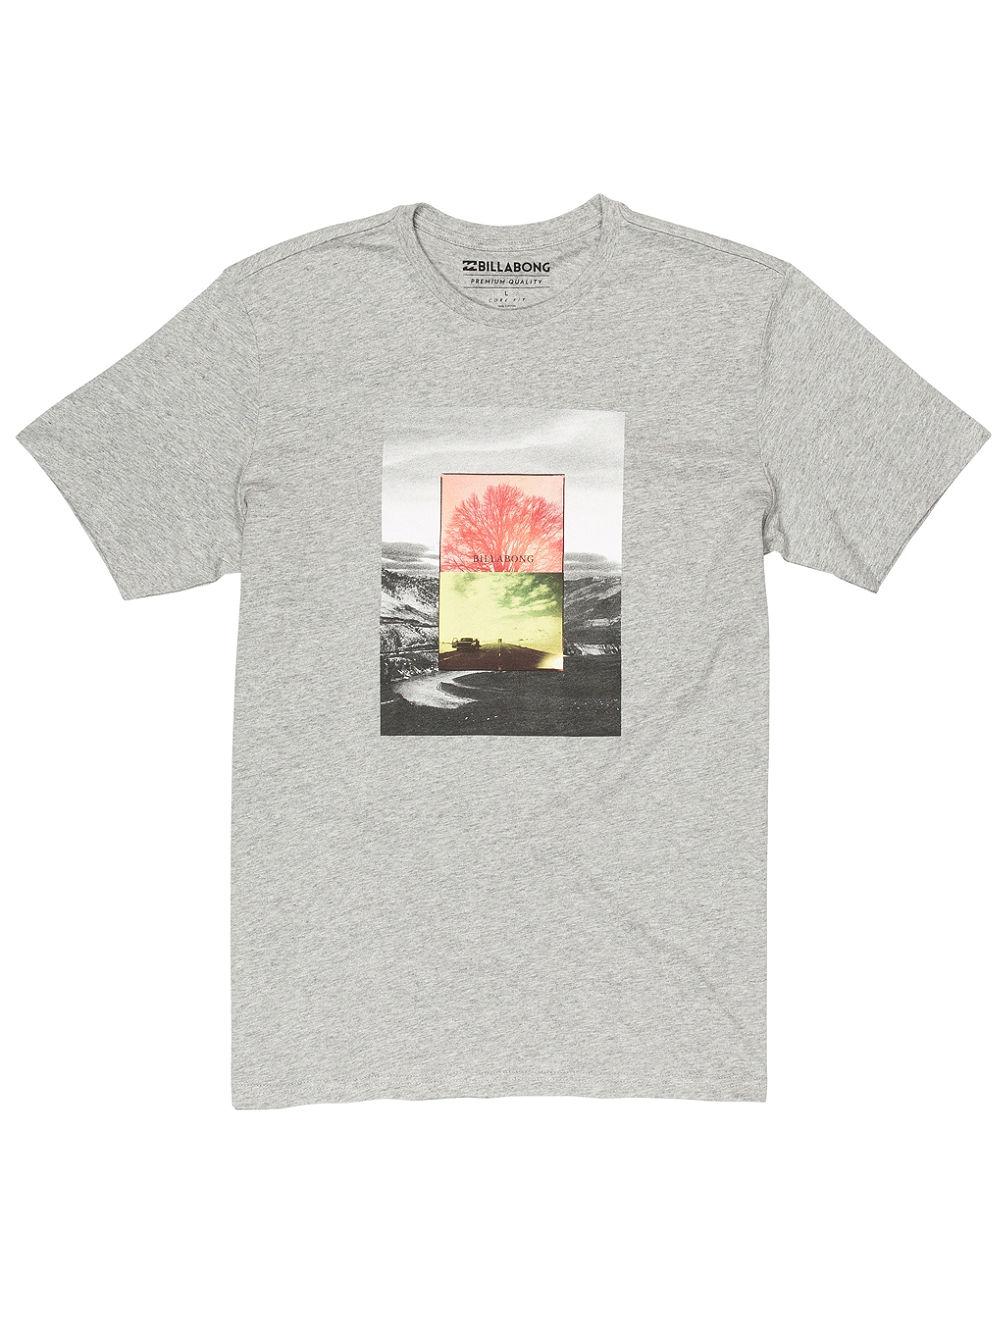 Buy Billabong Frames T-Shirt online at blue-tomato.com